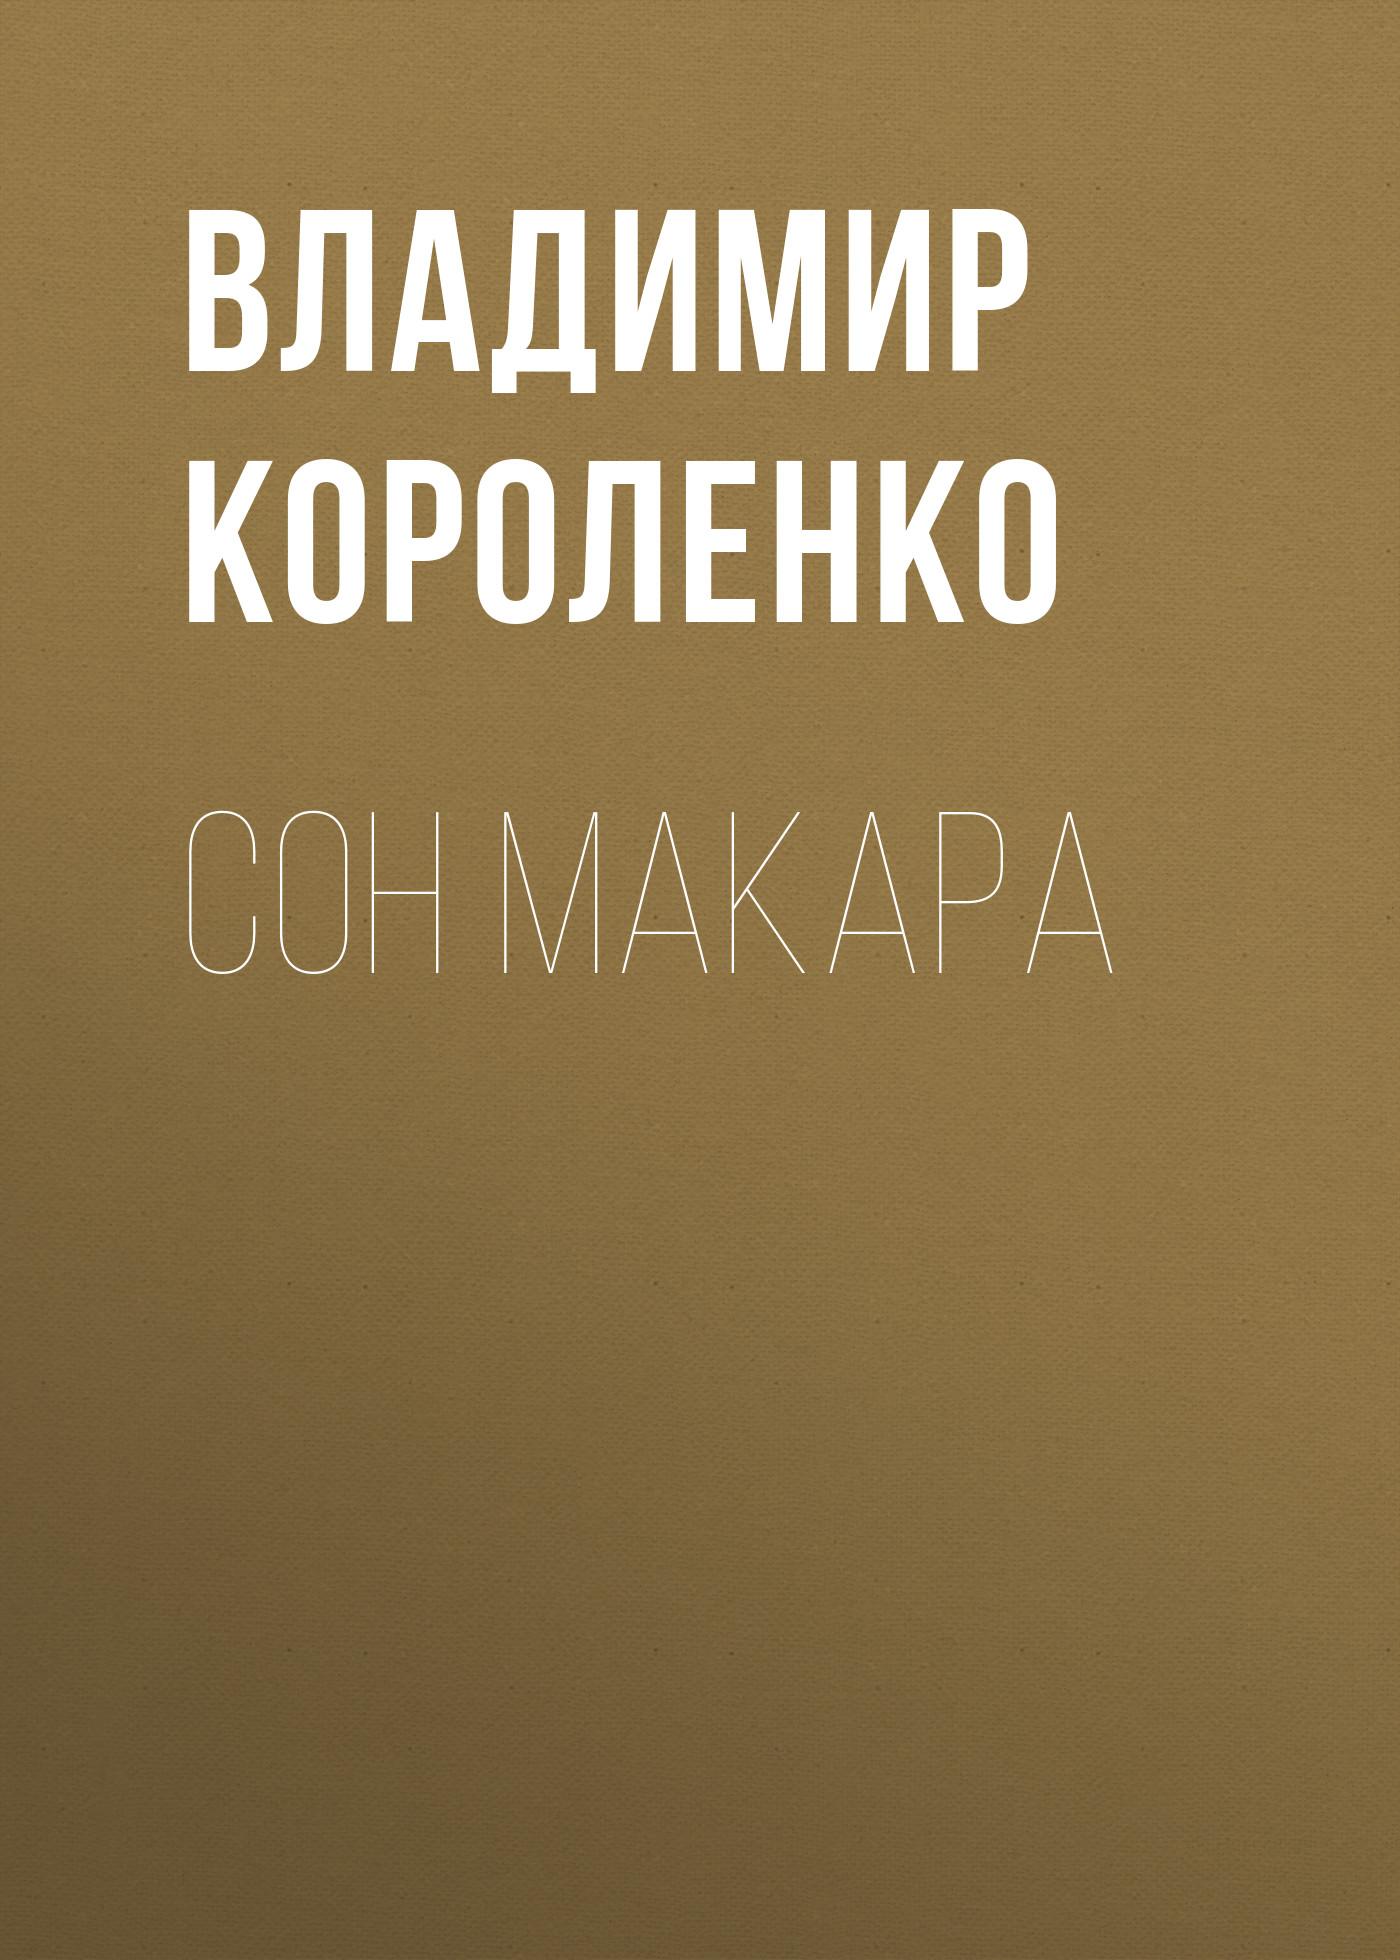 Купить книгу Сон Макара, автора Владимира Короленко